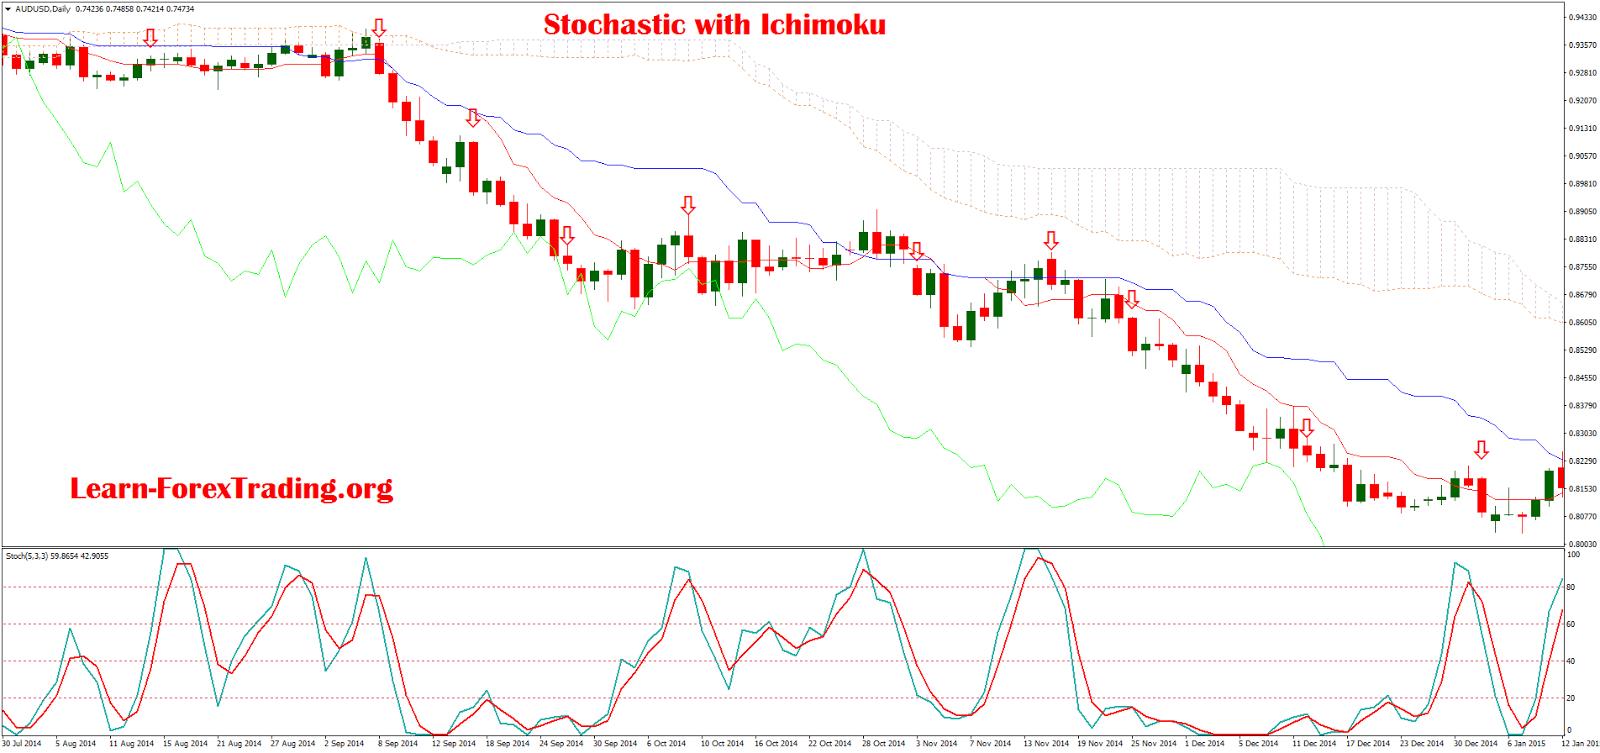 Trading forex with ichimoku